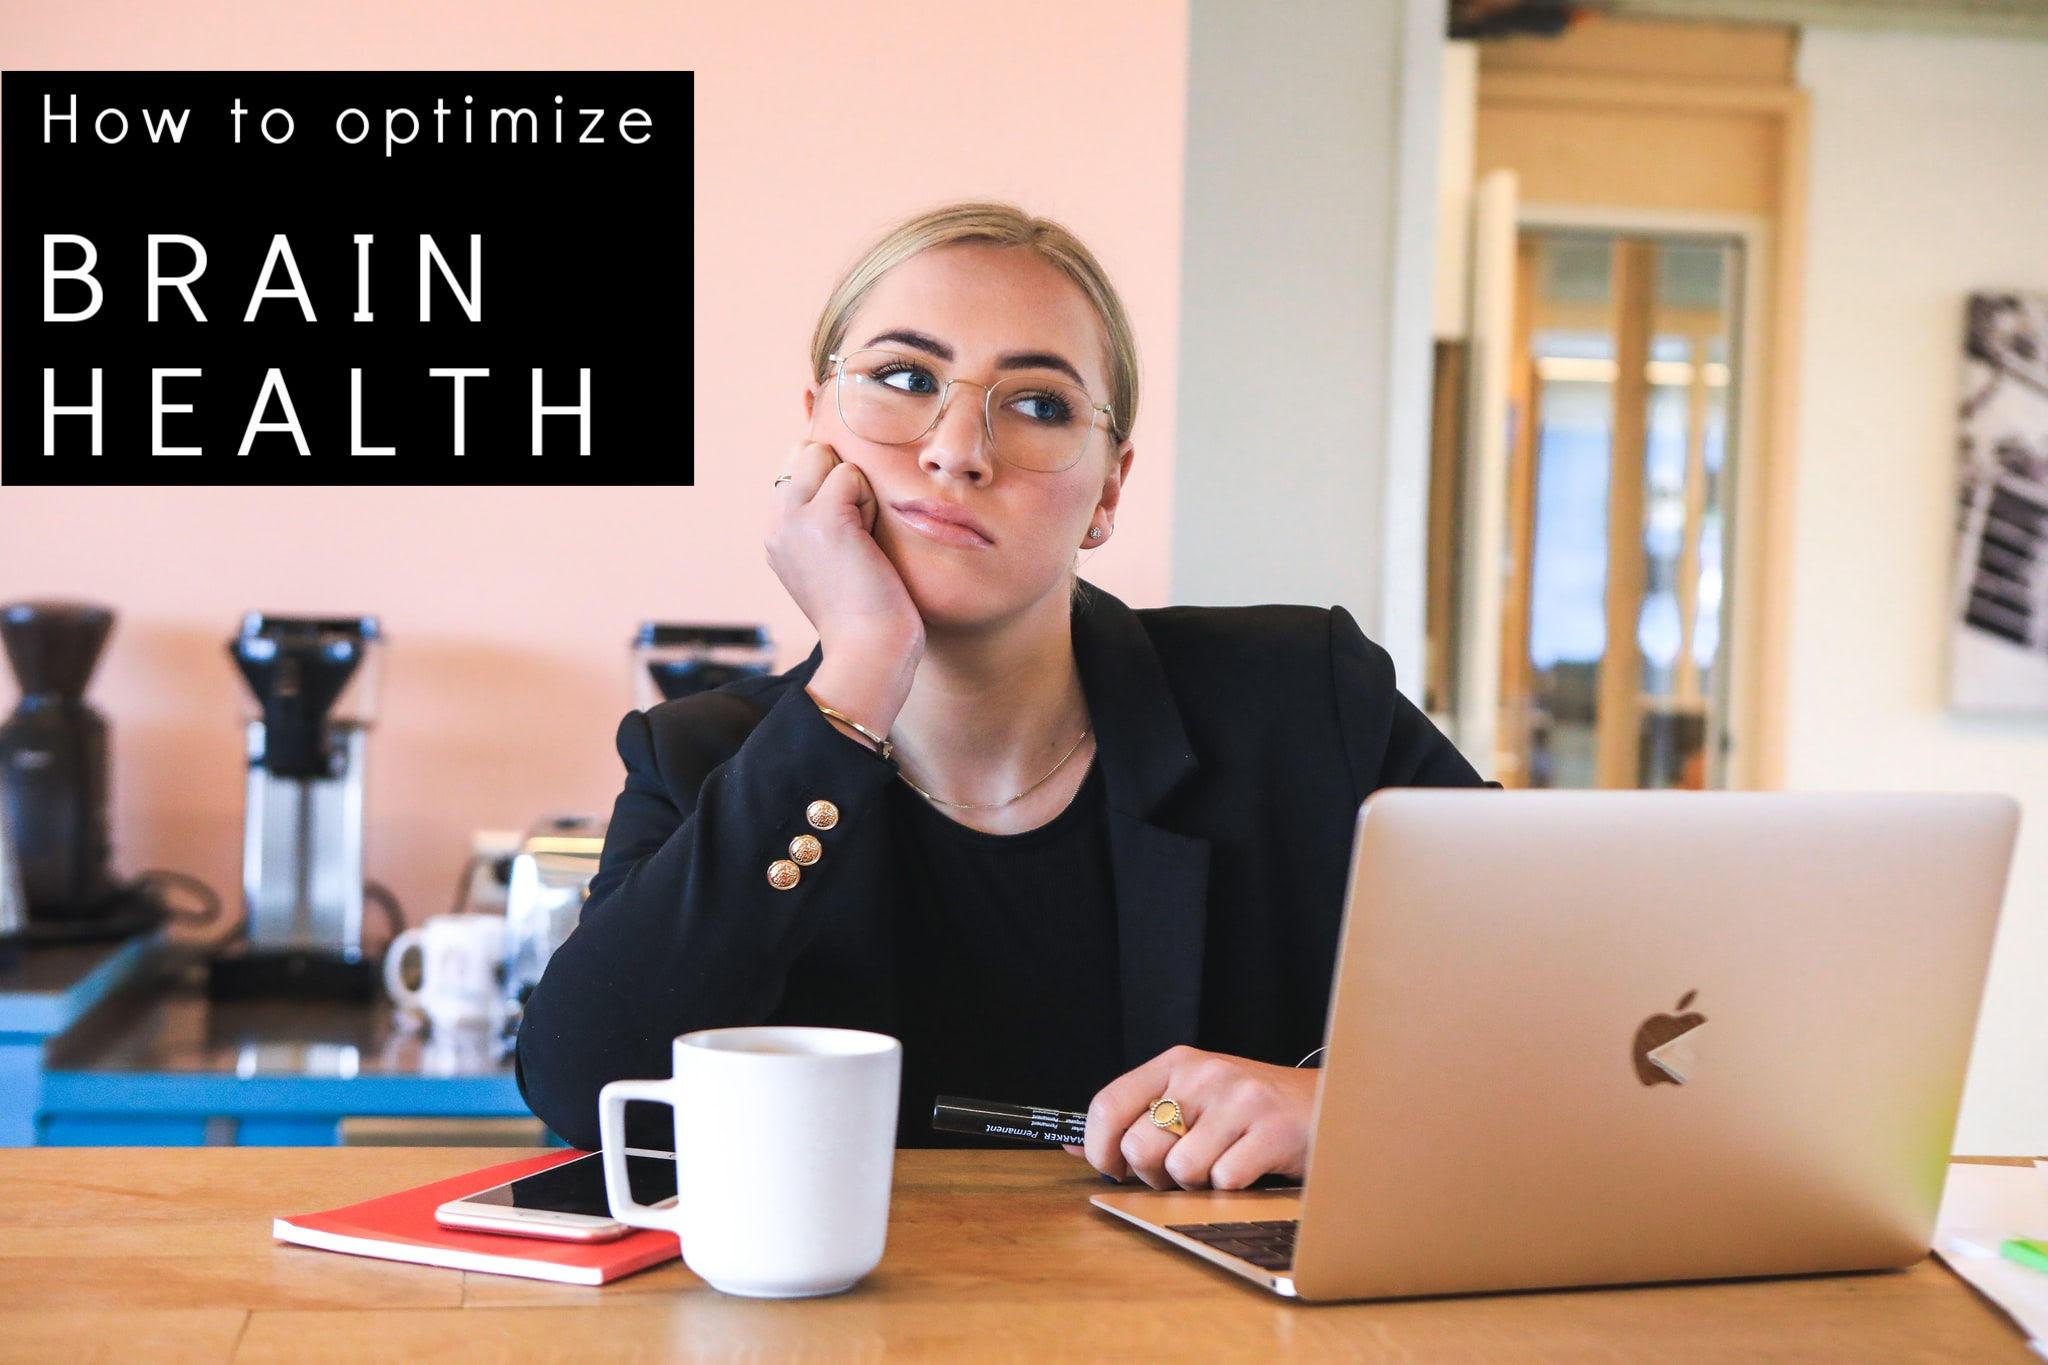 Optimize Brain Health